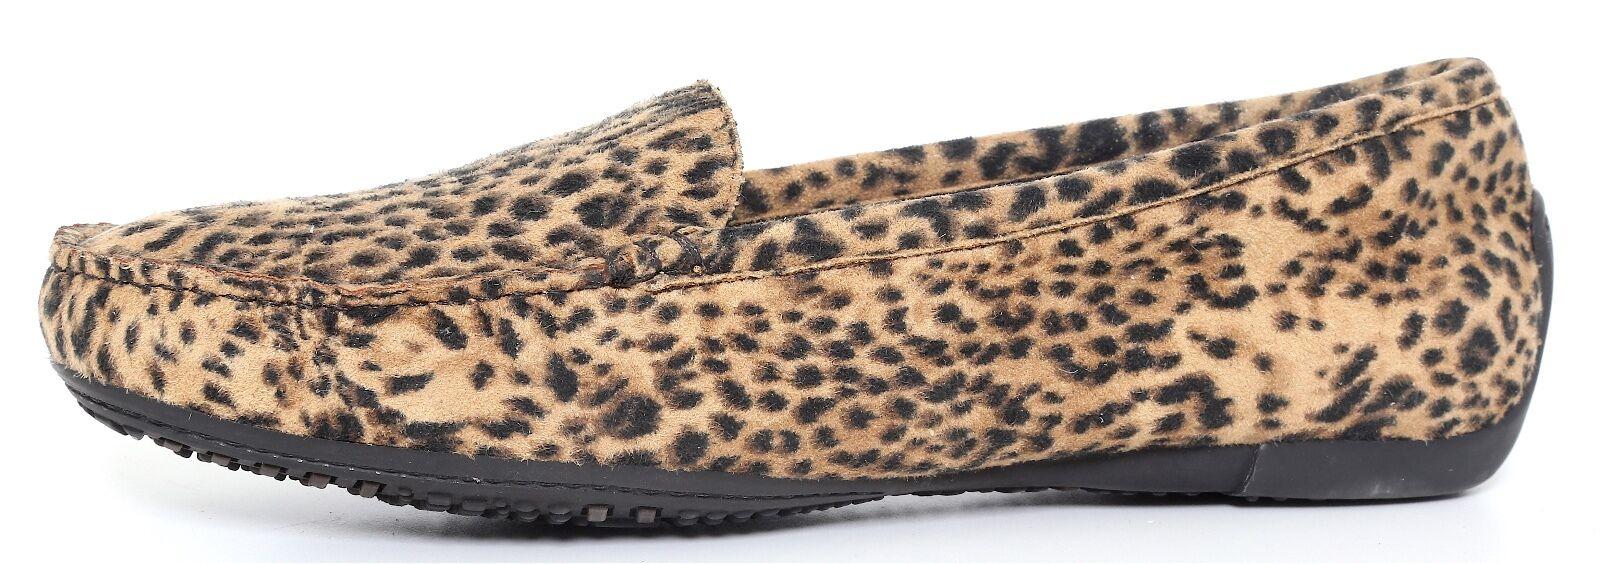 Stuart Weitzman Women's Black Brown Suede Cheetah Print Slip Ons 2750 Sz 8.5 M